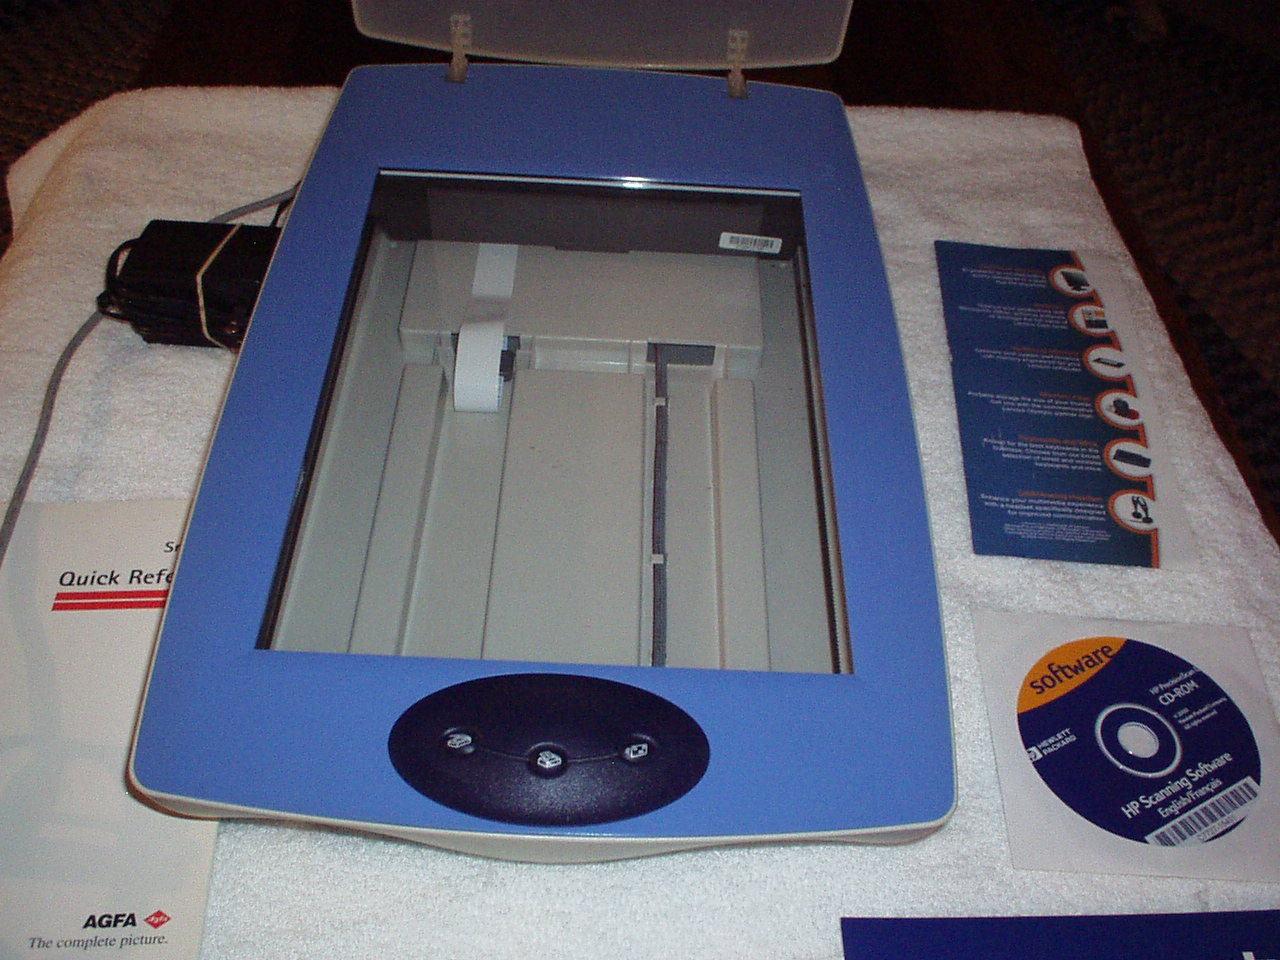 Umax 2000p scanner